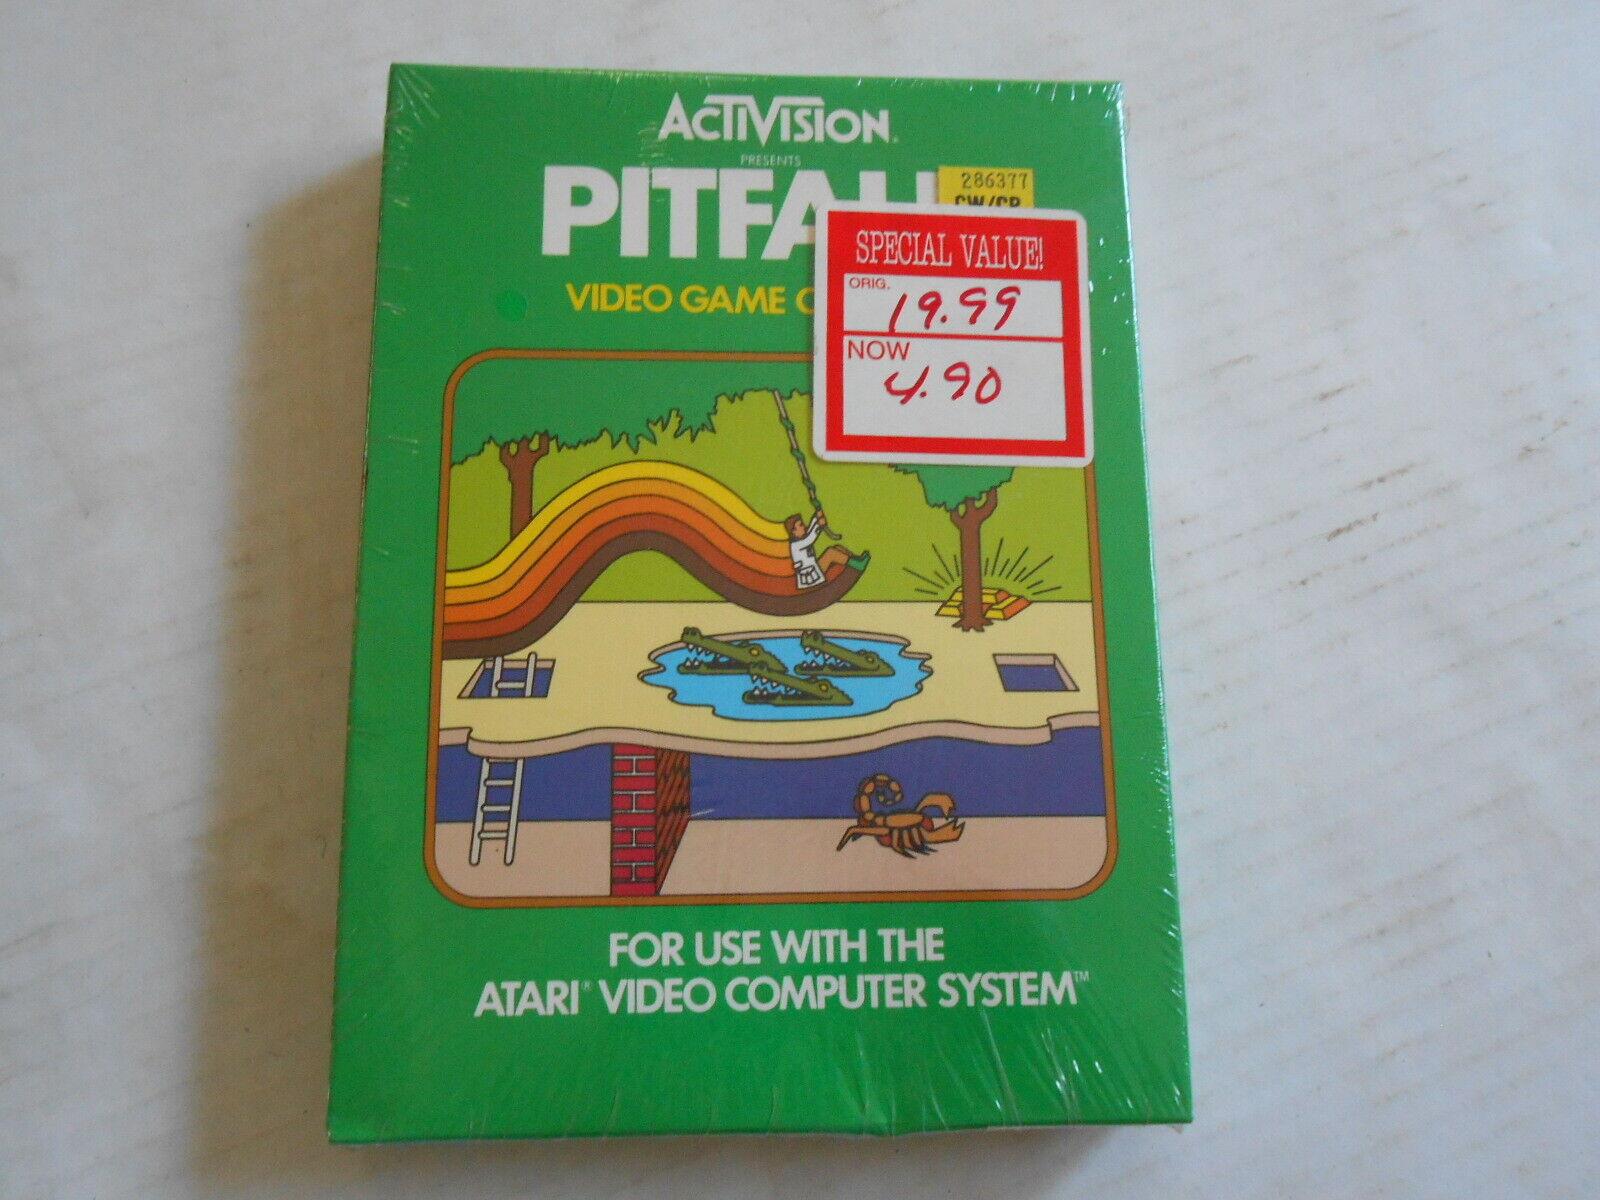 Computer Games - Activision PITFALL video game Atari Video Computer System 1982 New Sealed